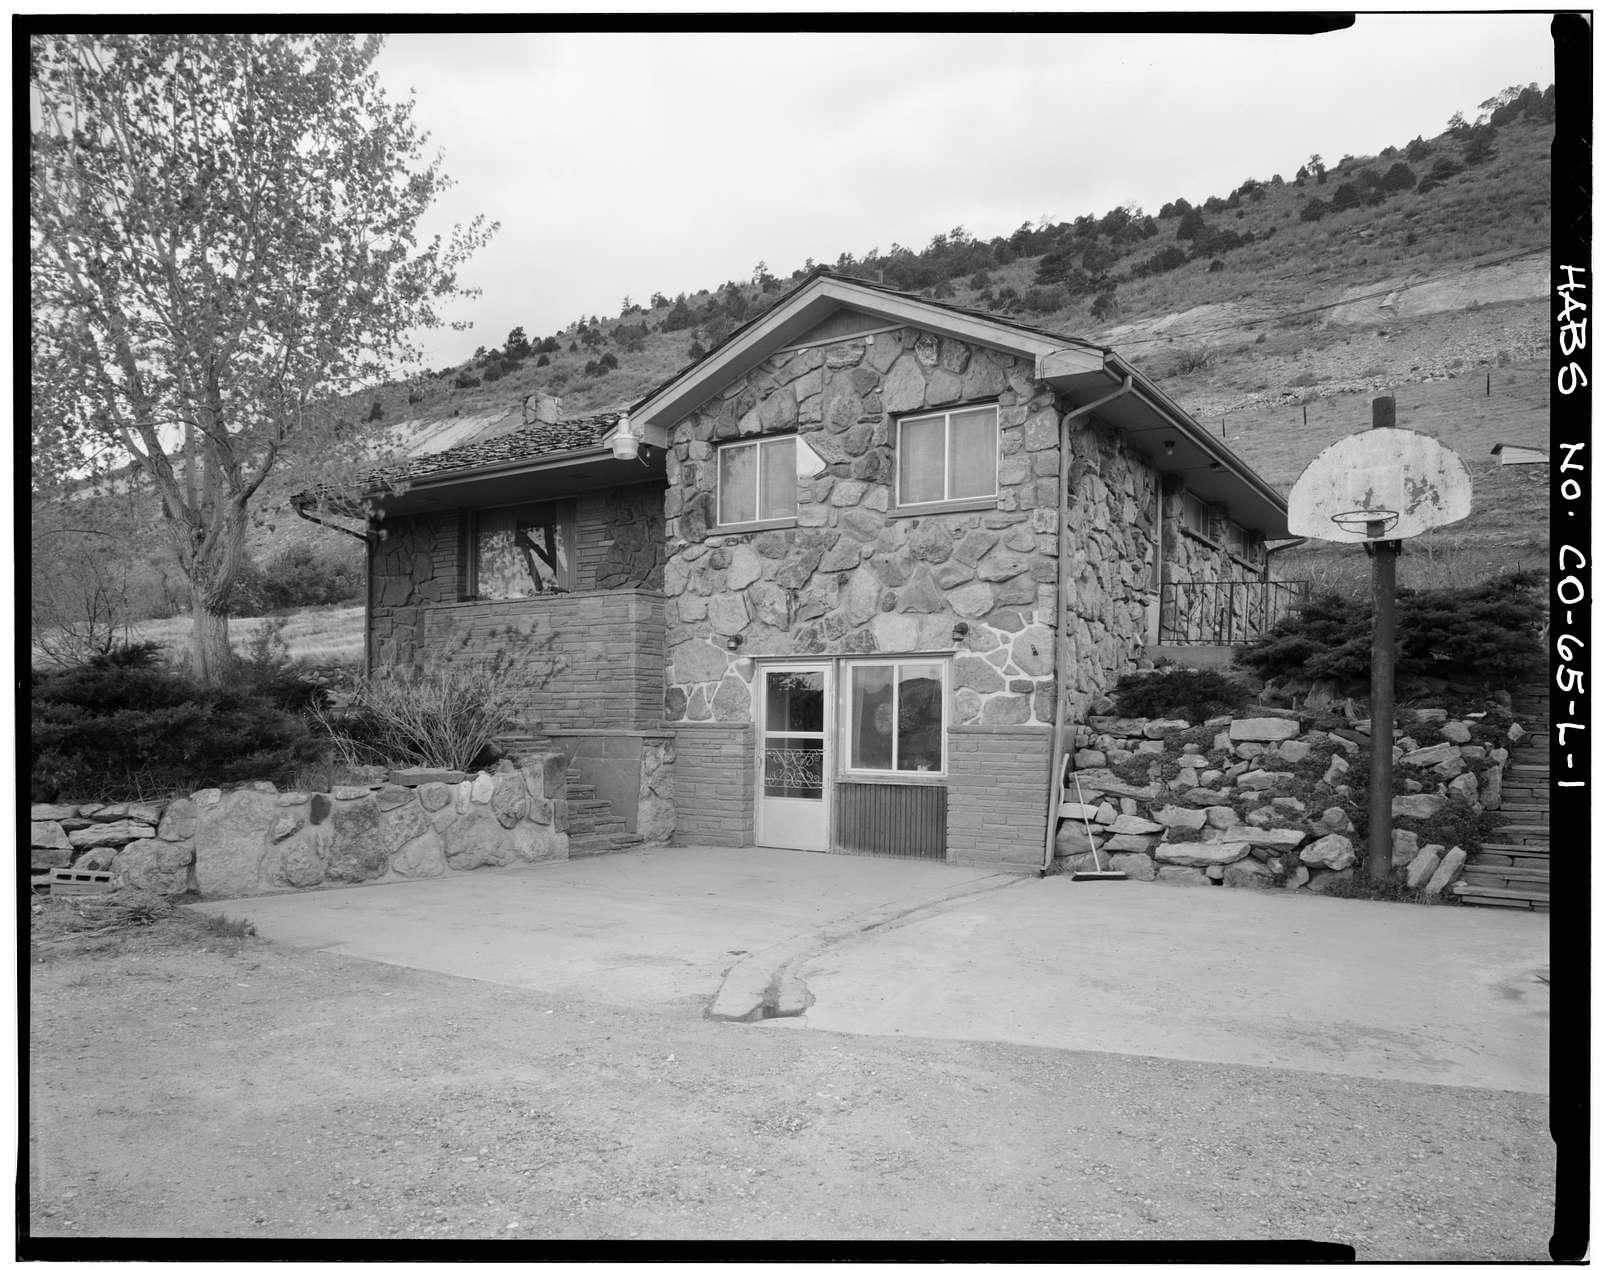 Rooney Ranch, Eileen Rooney House, Rooney Road & West Alamdea Parkway, Morrison, Jefferson County, CO